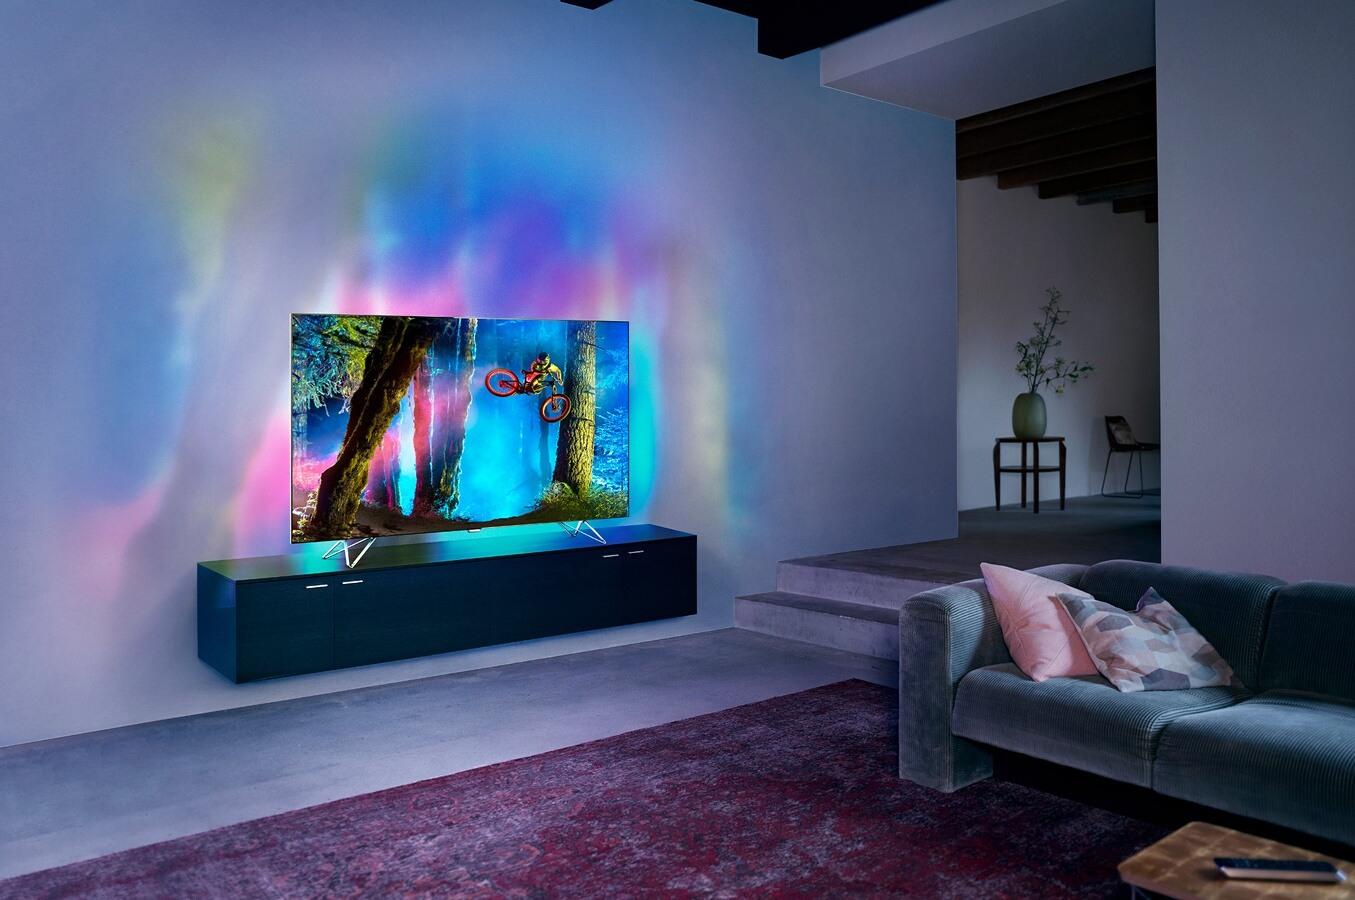 tv led philips 65pus8901 ambilux 4k uhd 65pus8901. Black Bedroom Furniture Sets. Home Design Ideas